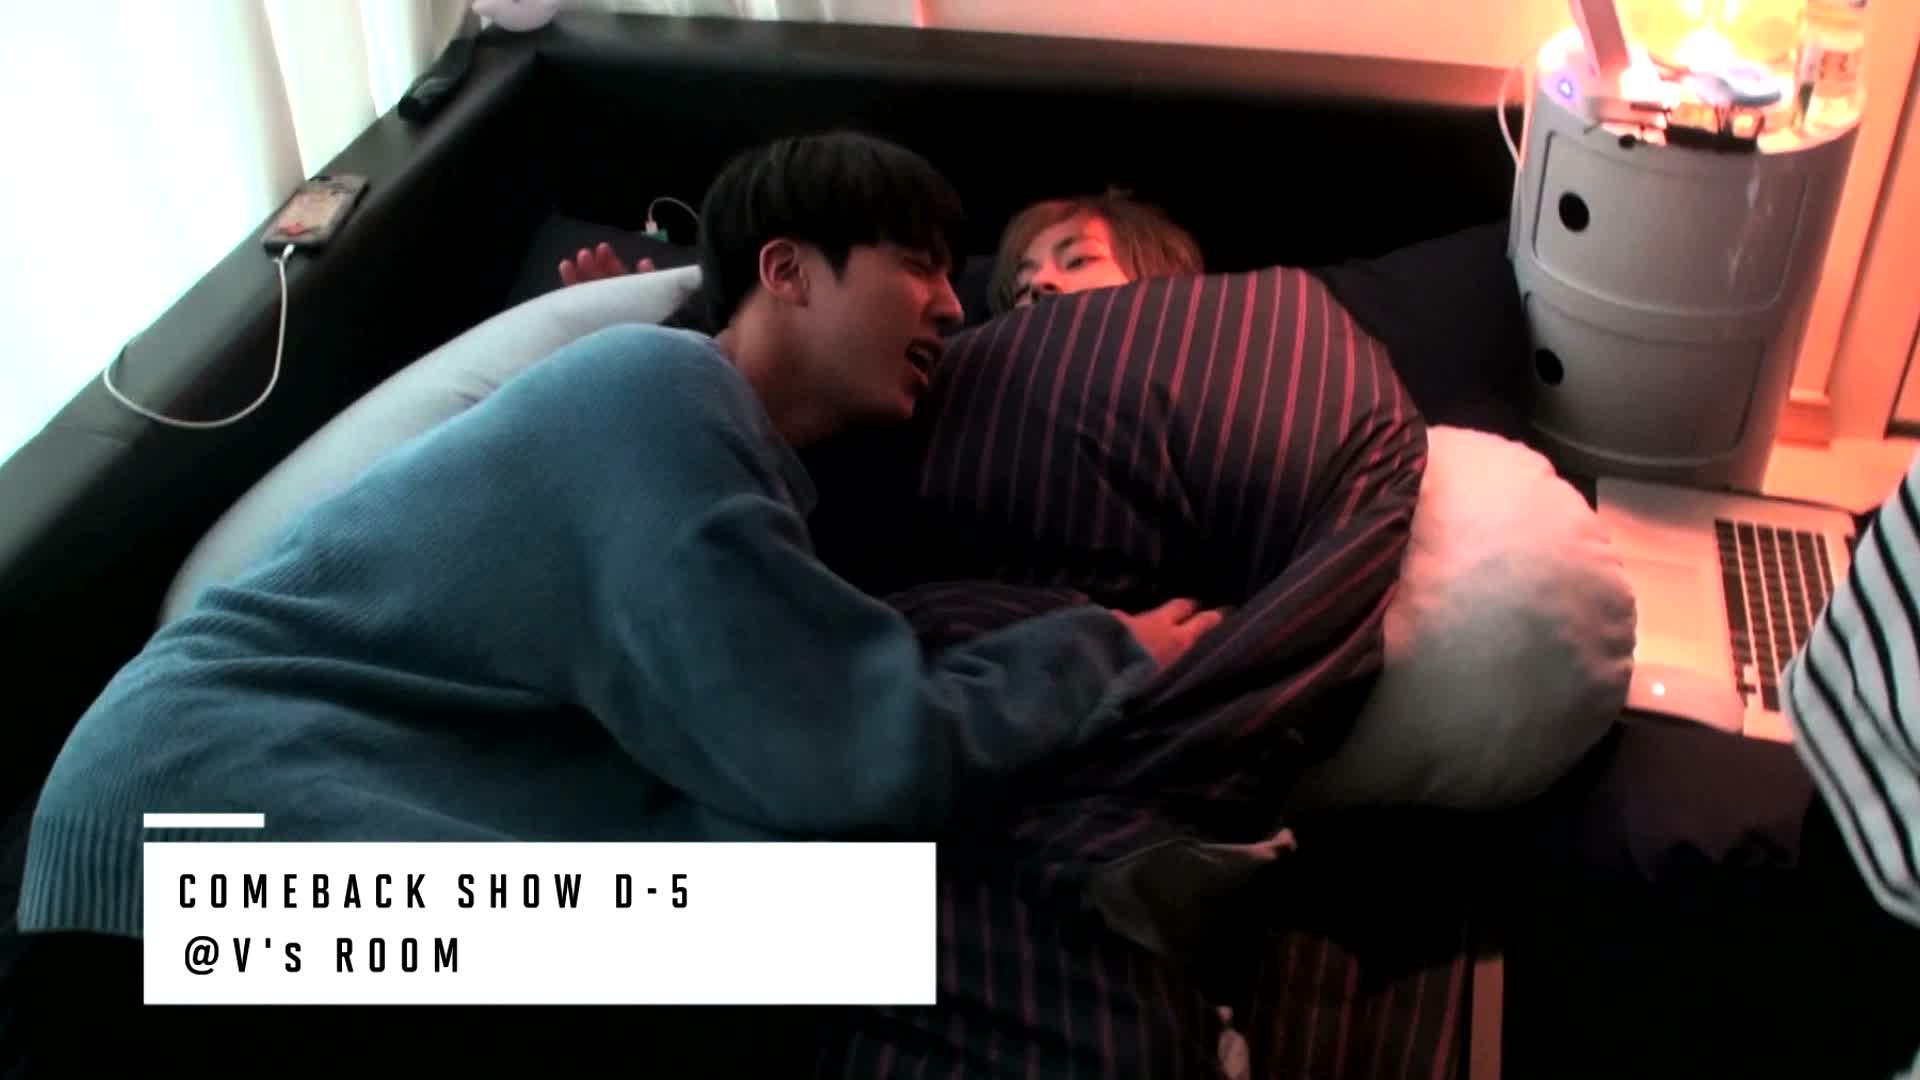 BTS Comeback Show - COMEBACK SHOW - BTS DNA - Watch Full